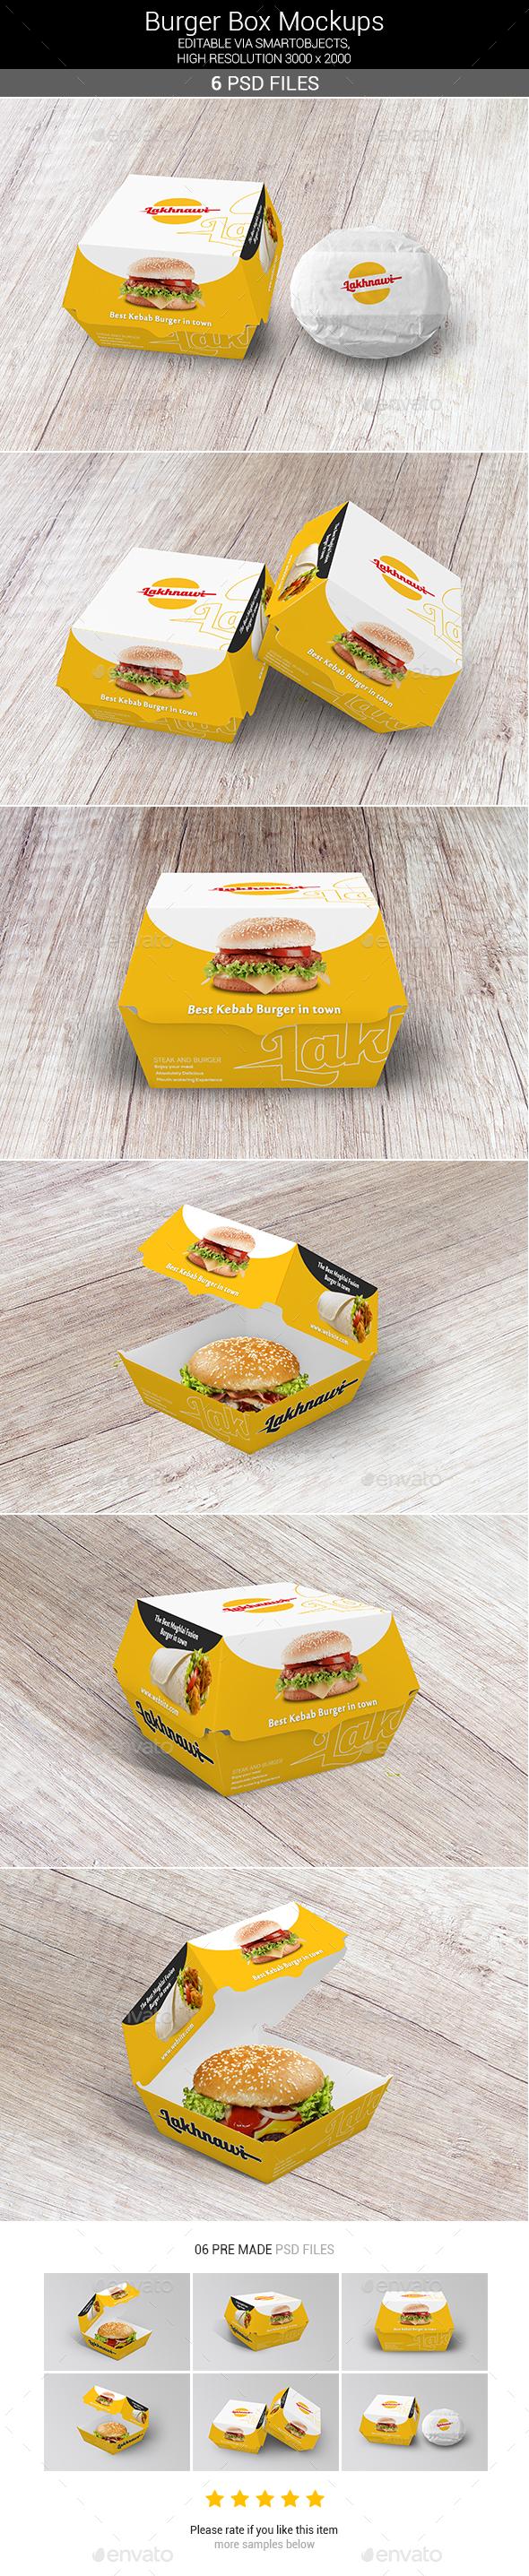 Burger Box Mockups - Food and Drink Packaging